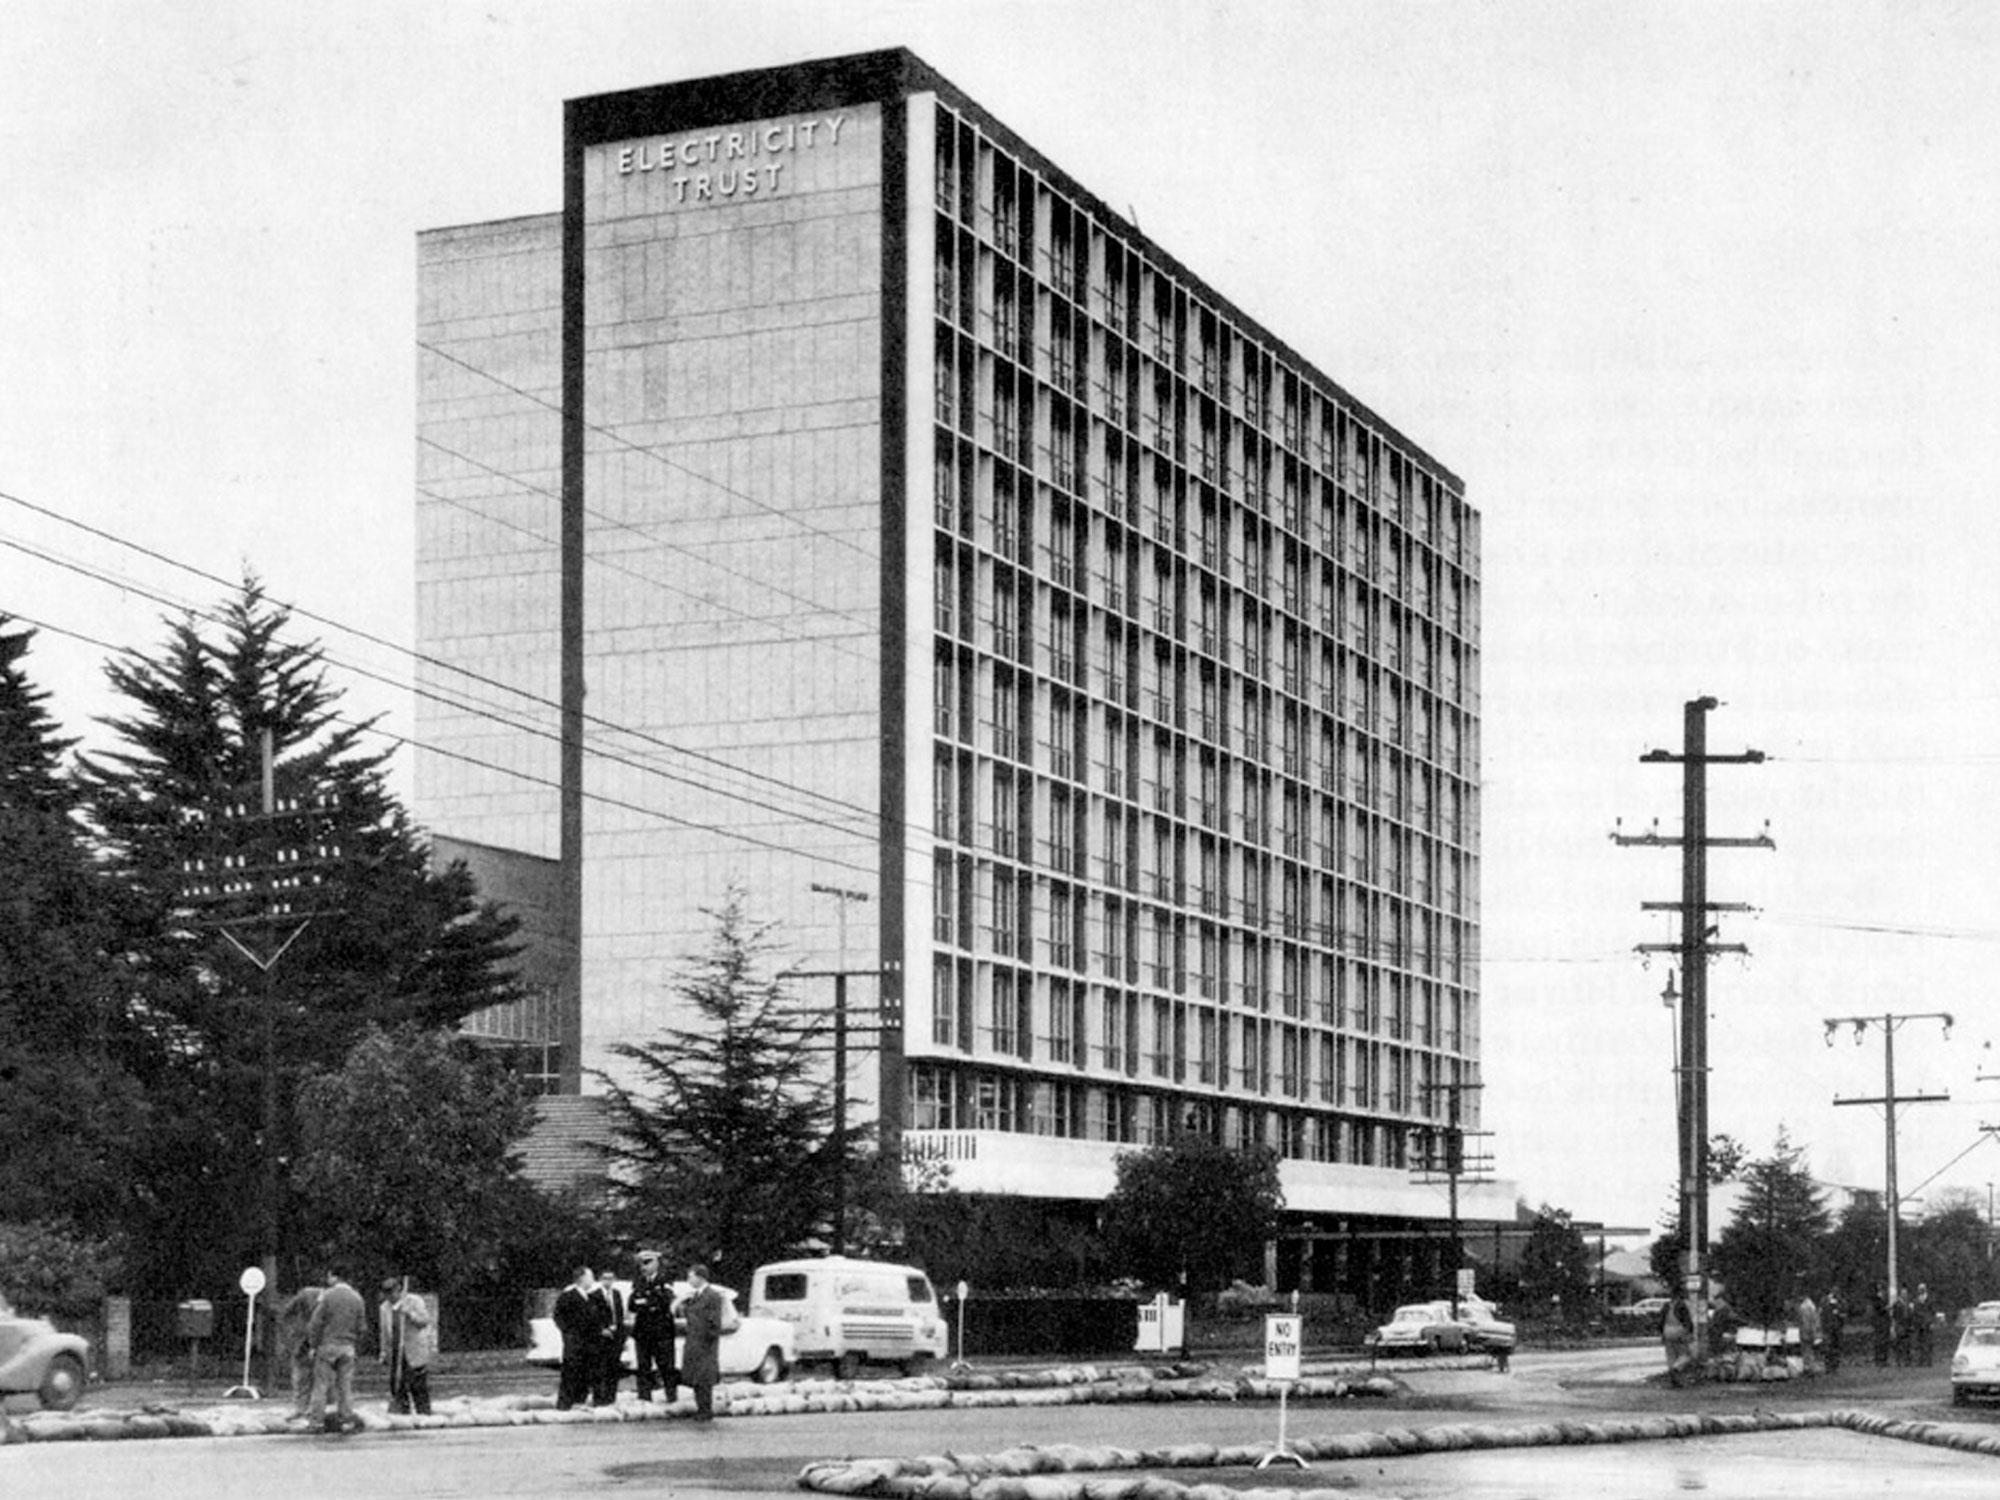 The Original 1960's 'ETSA' building